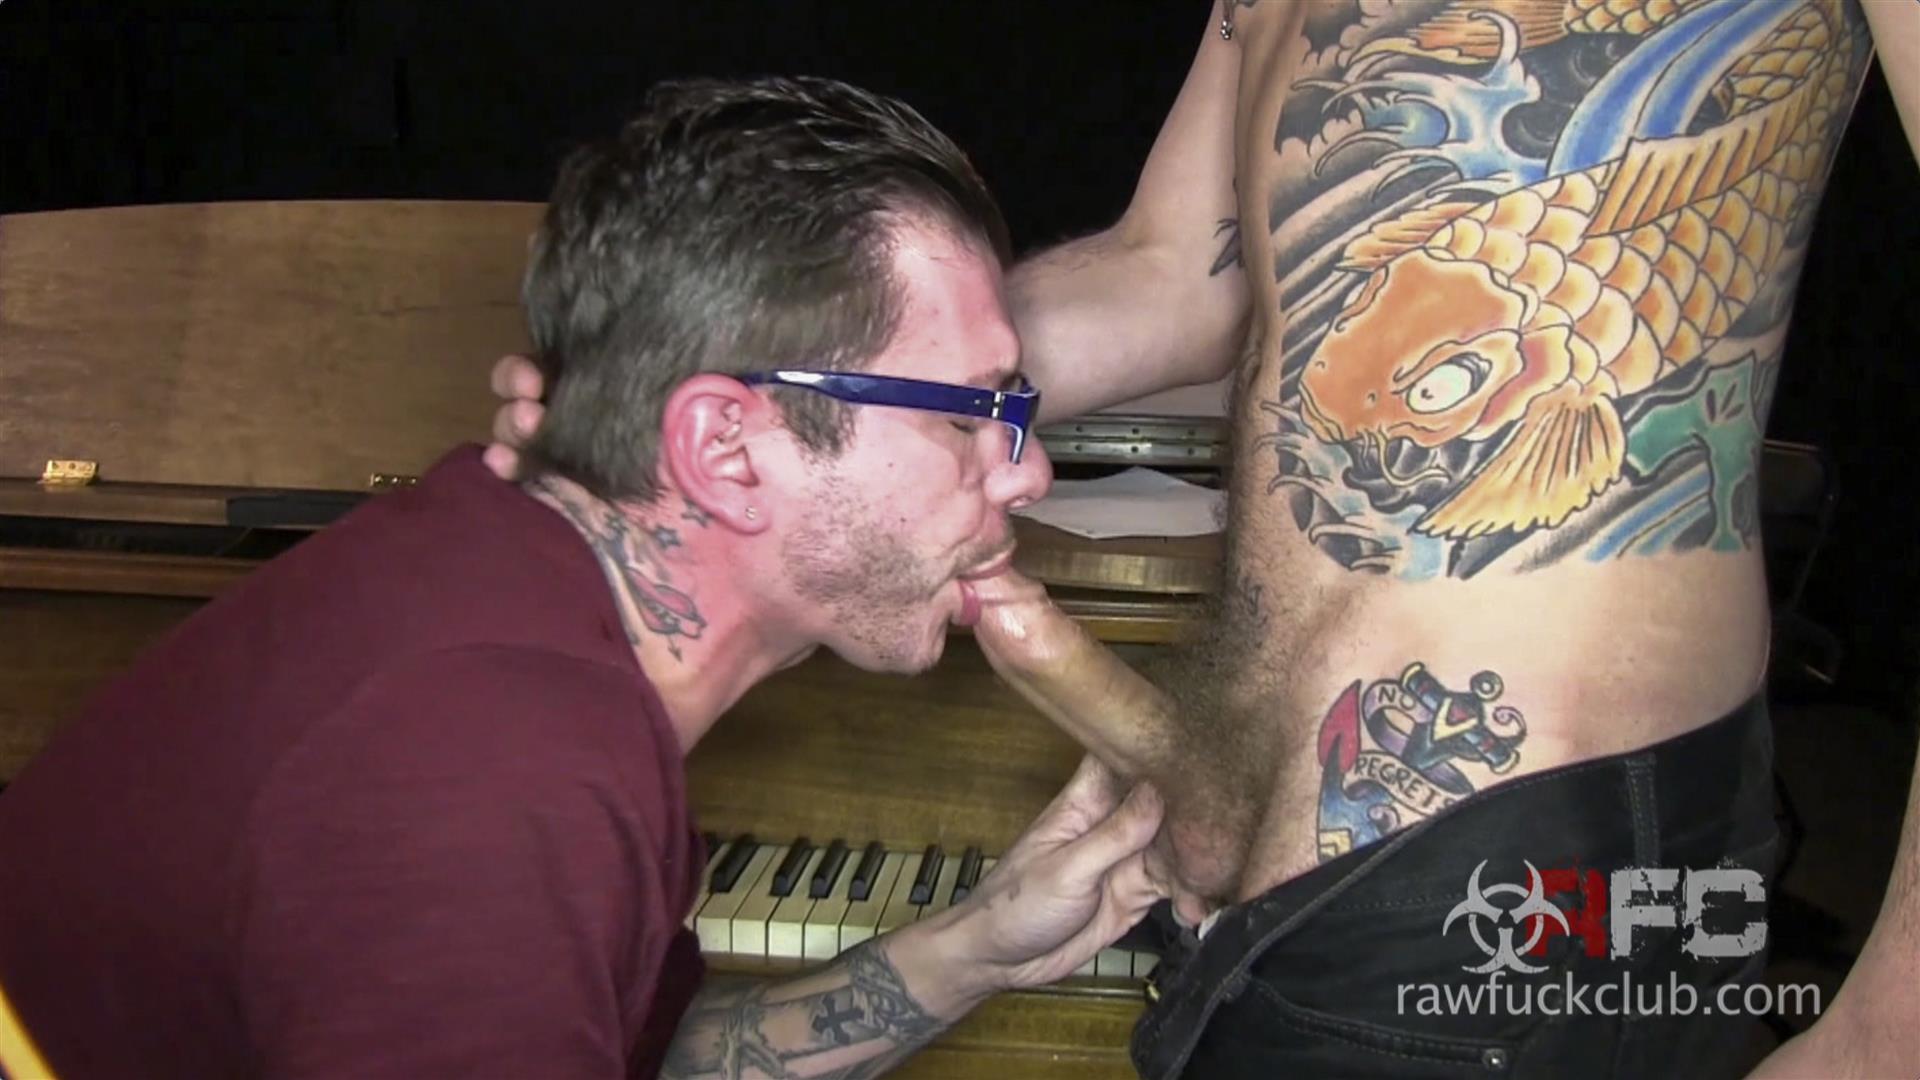 Raw-Fuck-Club-Tristan-Mathews-and-Luke-Harding-Scruffy-Guys-Having-Bareback-Sex-Amateur-Gay-Porn-07 Scruffy Tristan Mathews Gets A Bareback Breeding And Facial